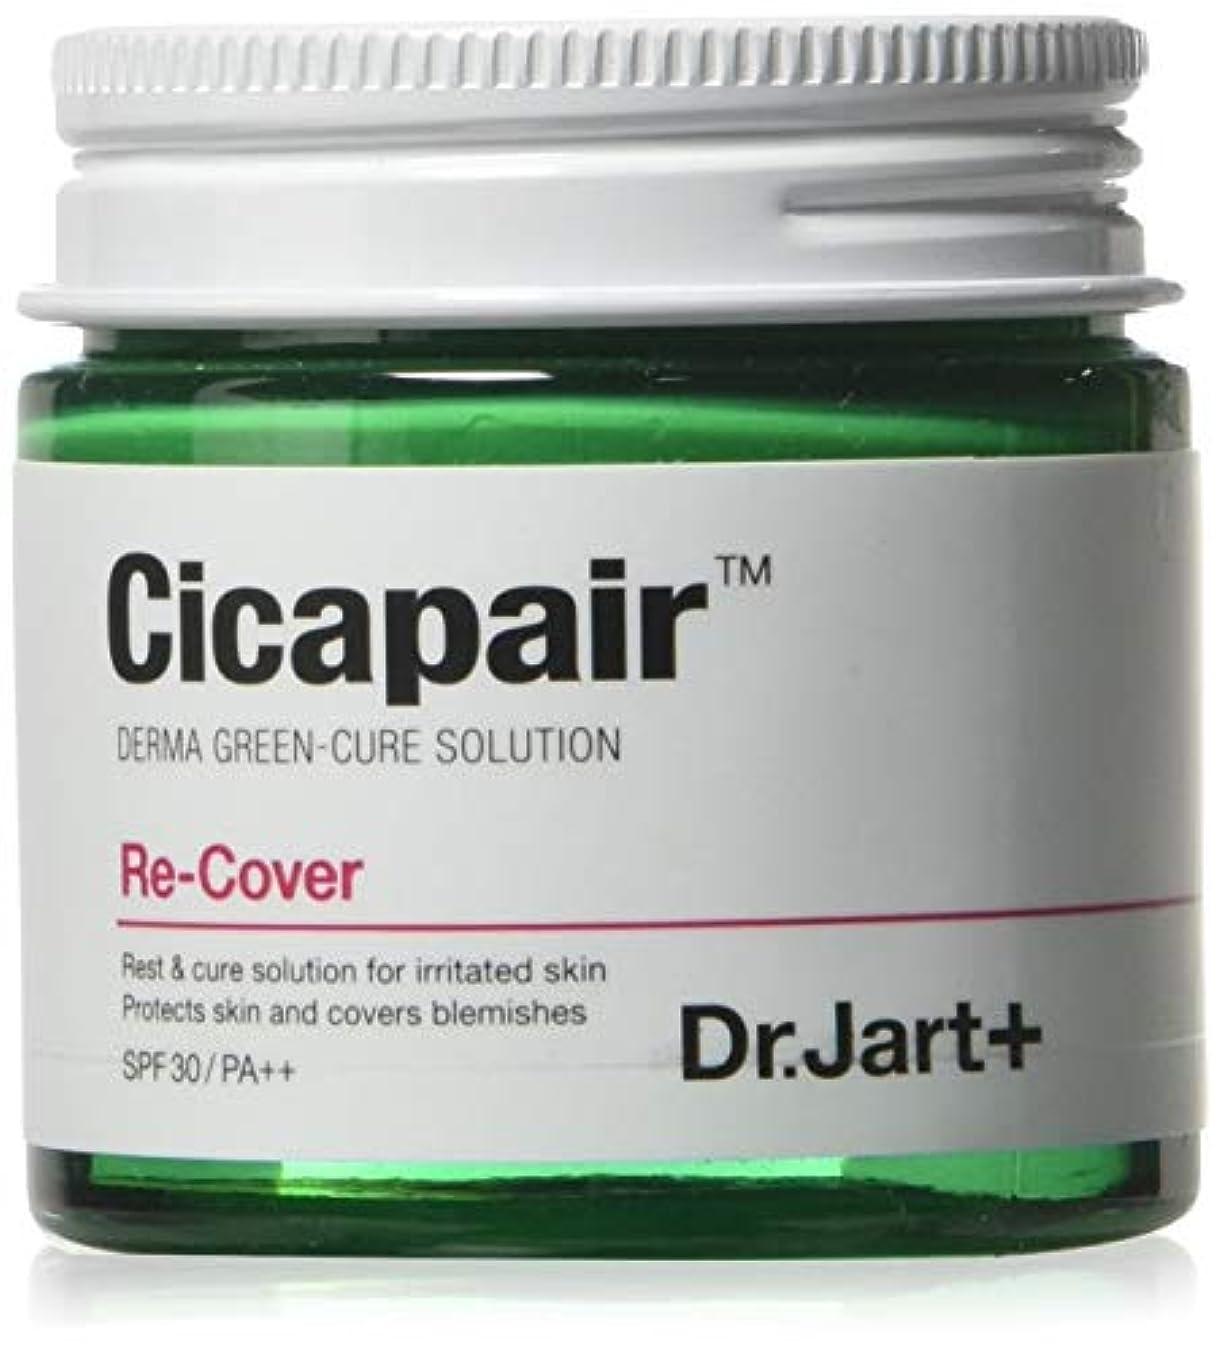 素人休日教Dr. Jart + Cicapair Cream 1.7 fl oz 50ml